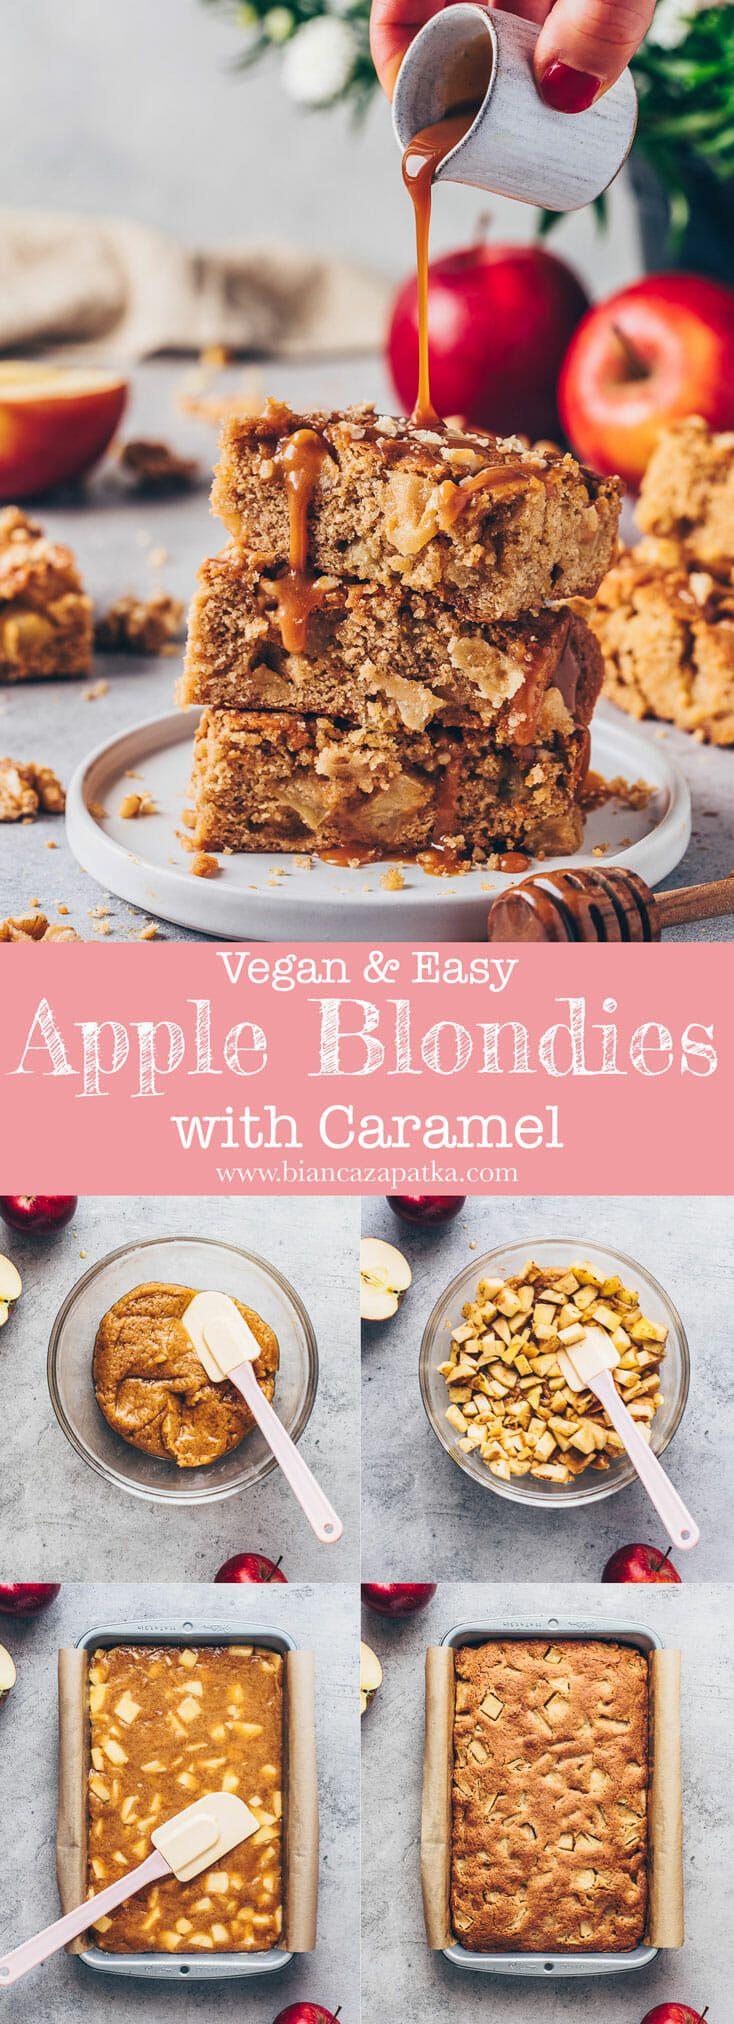 Apple Blondies with Caramel | Vegan Apple Bars - Bianca Zapatka | Recipes #falldesserts